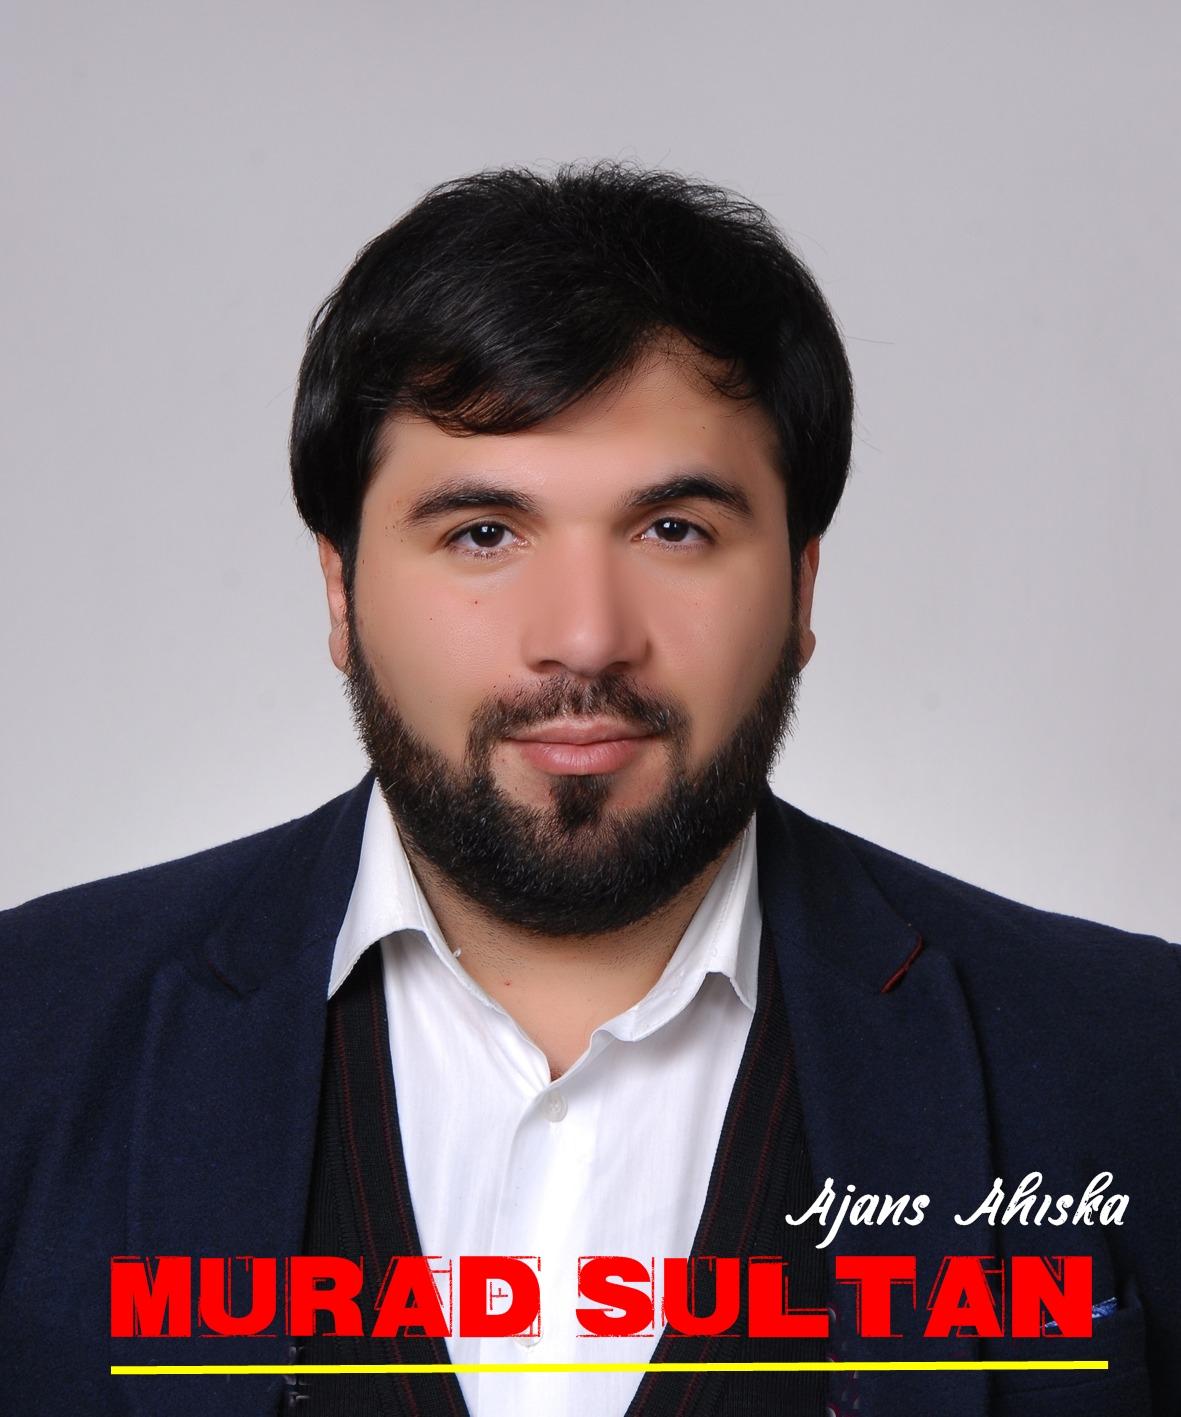 Murad Sultan